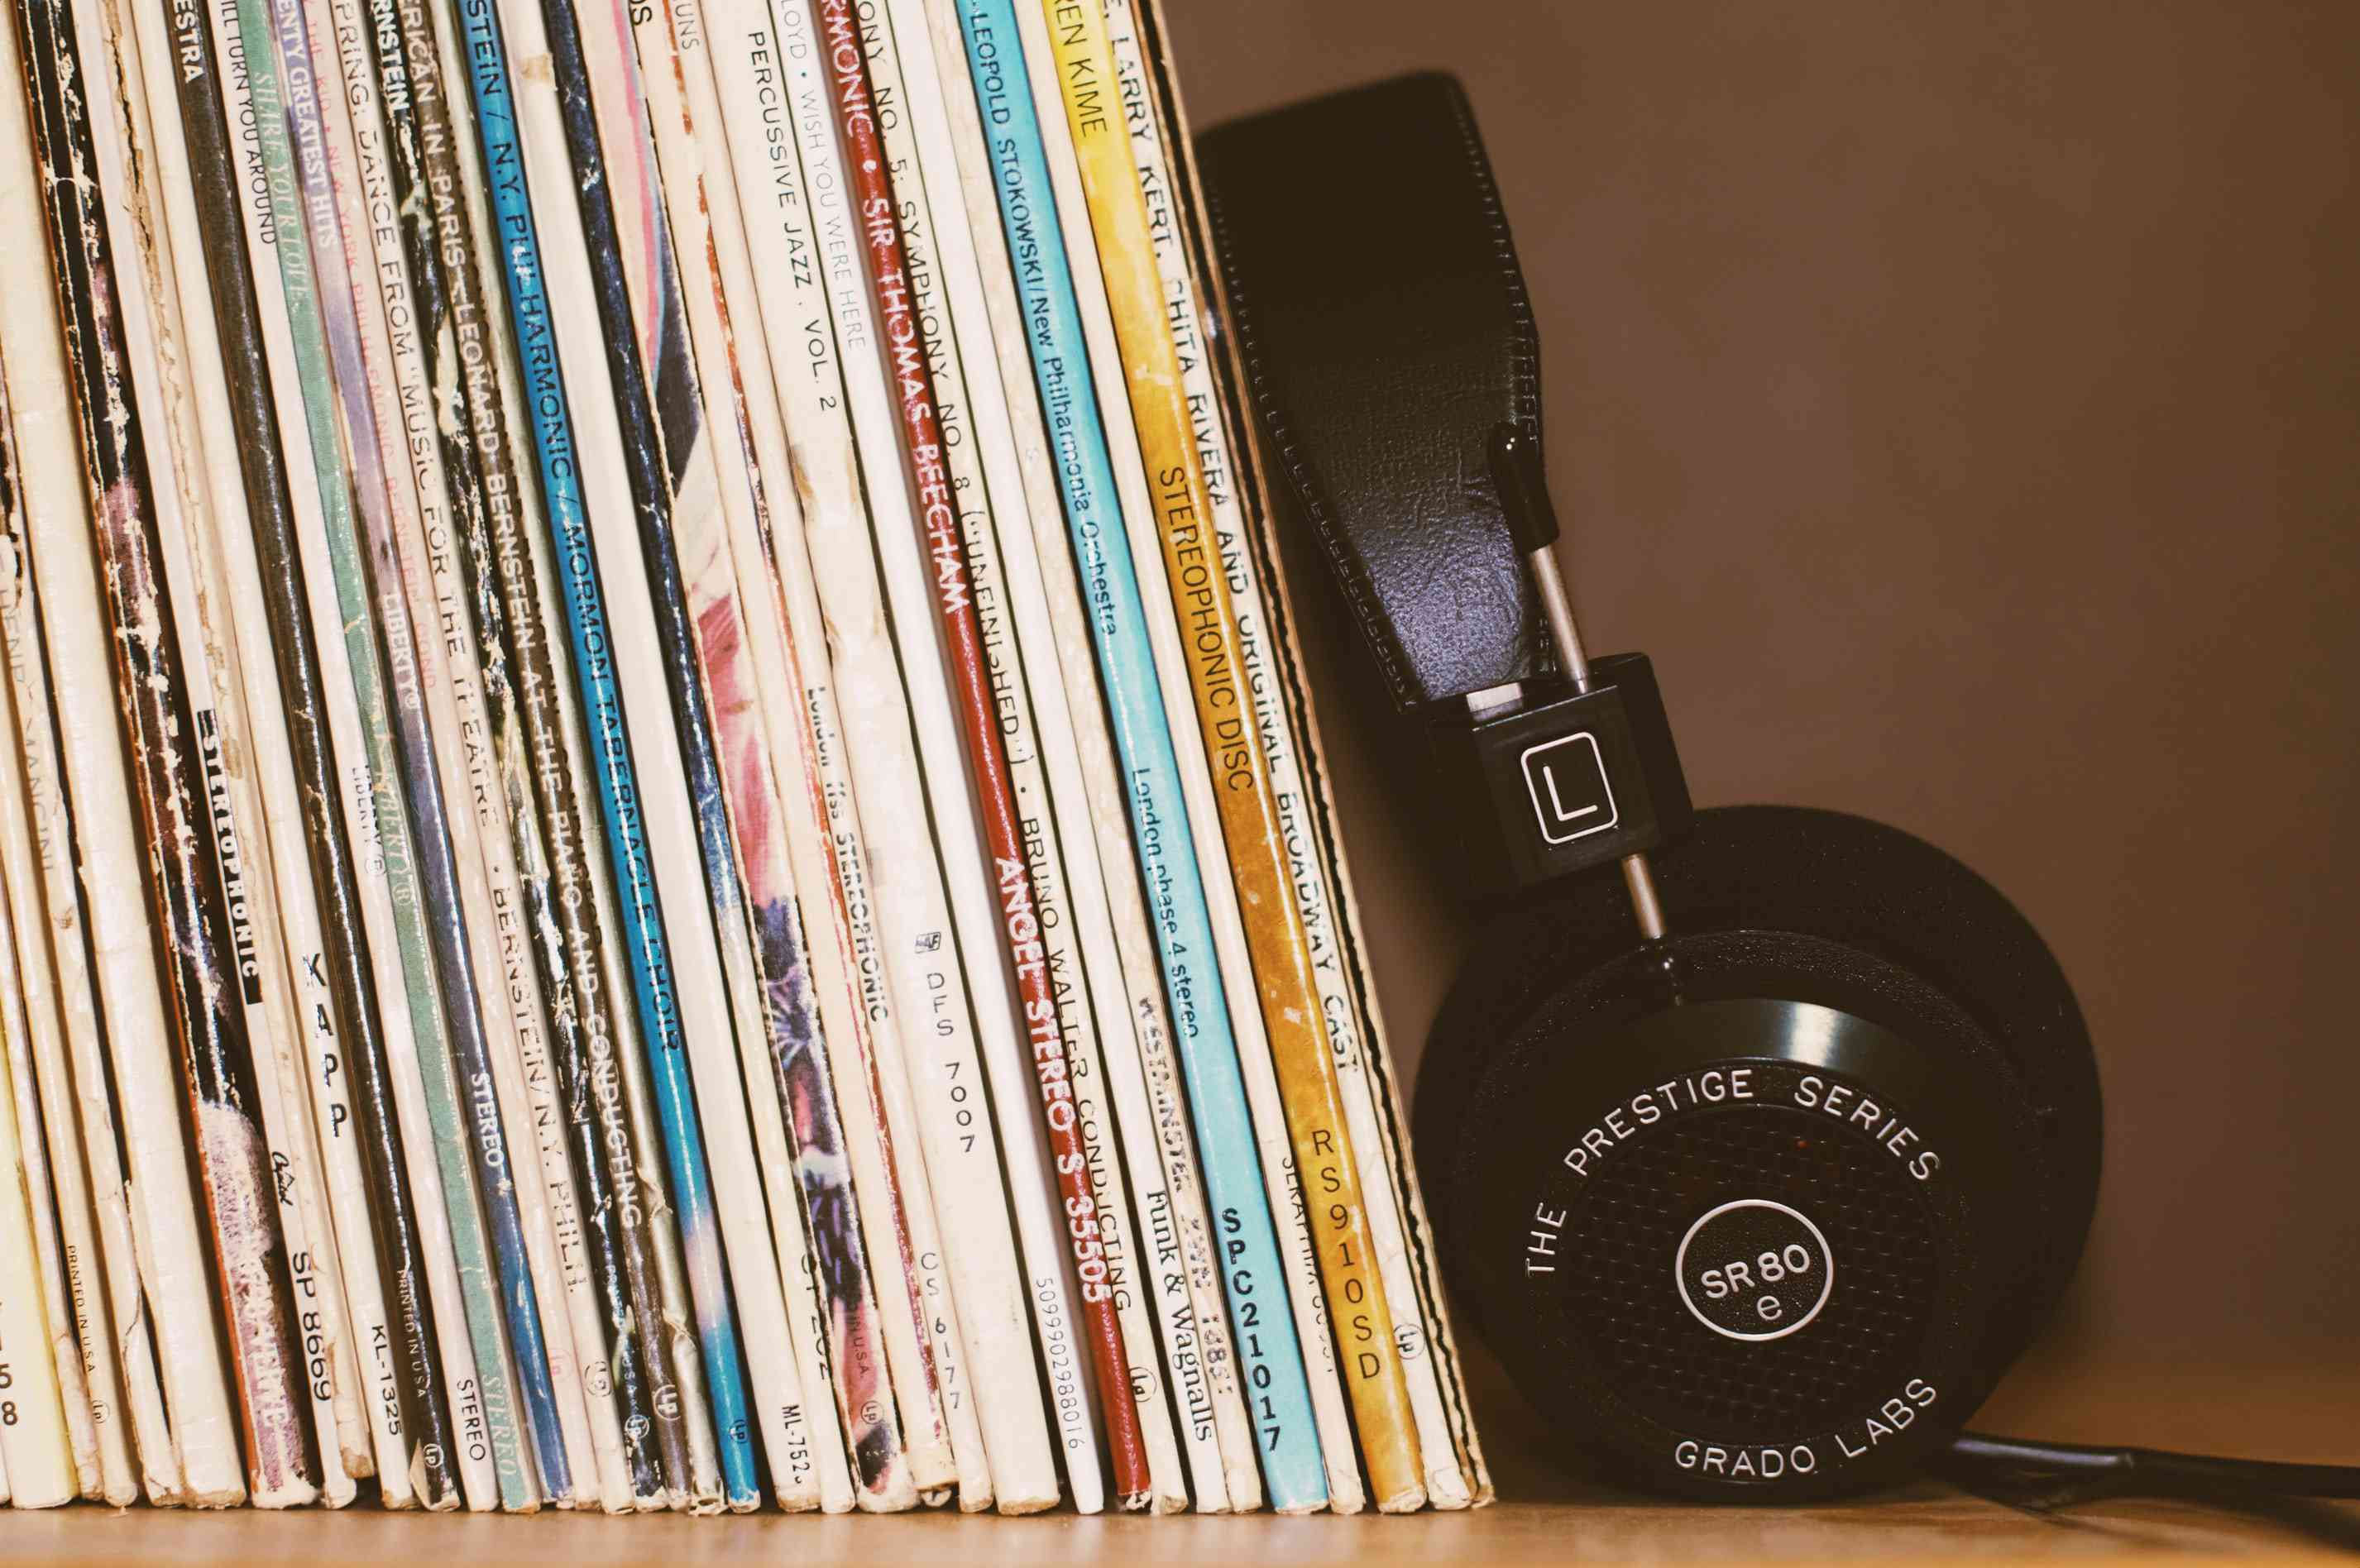 wireless headphones leaning against books